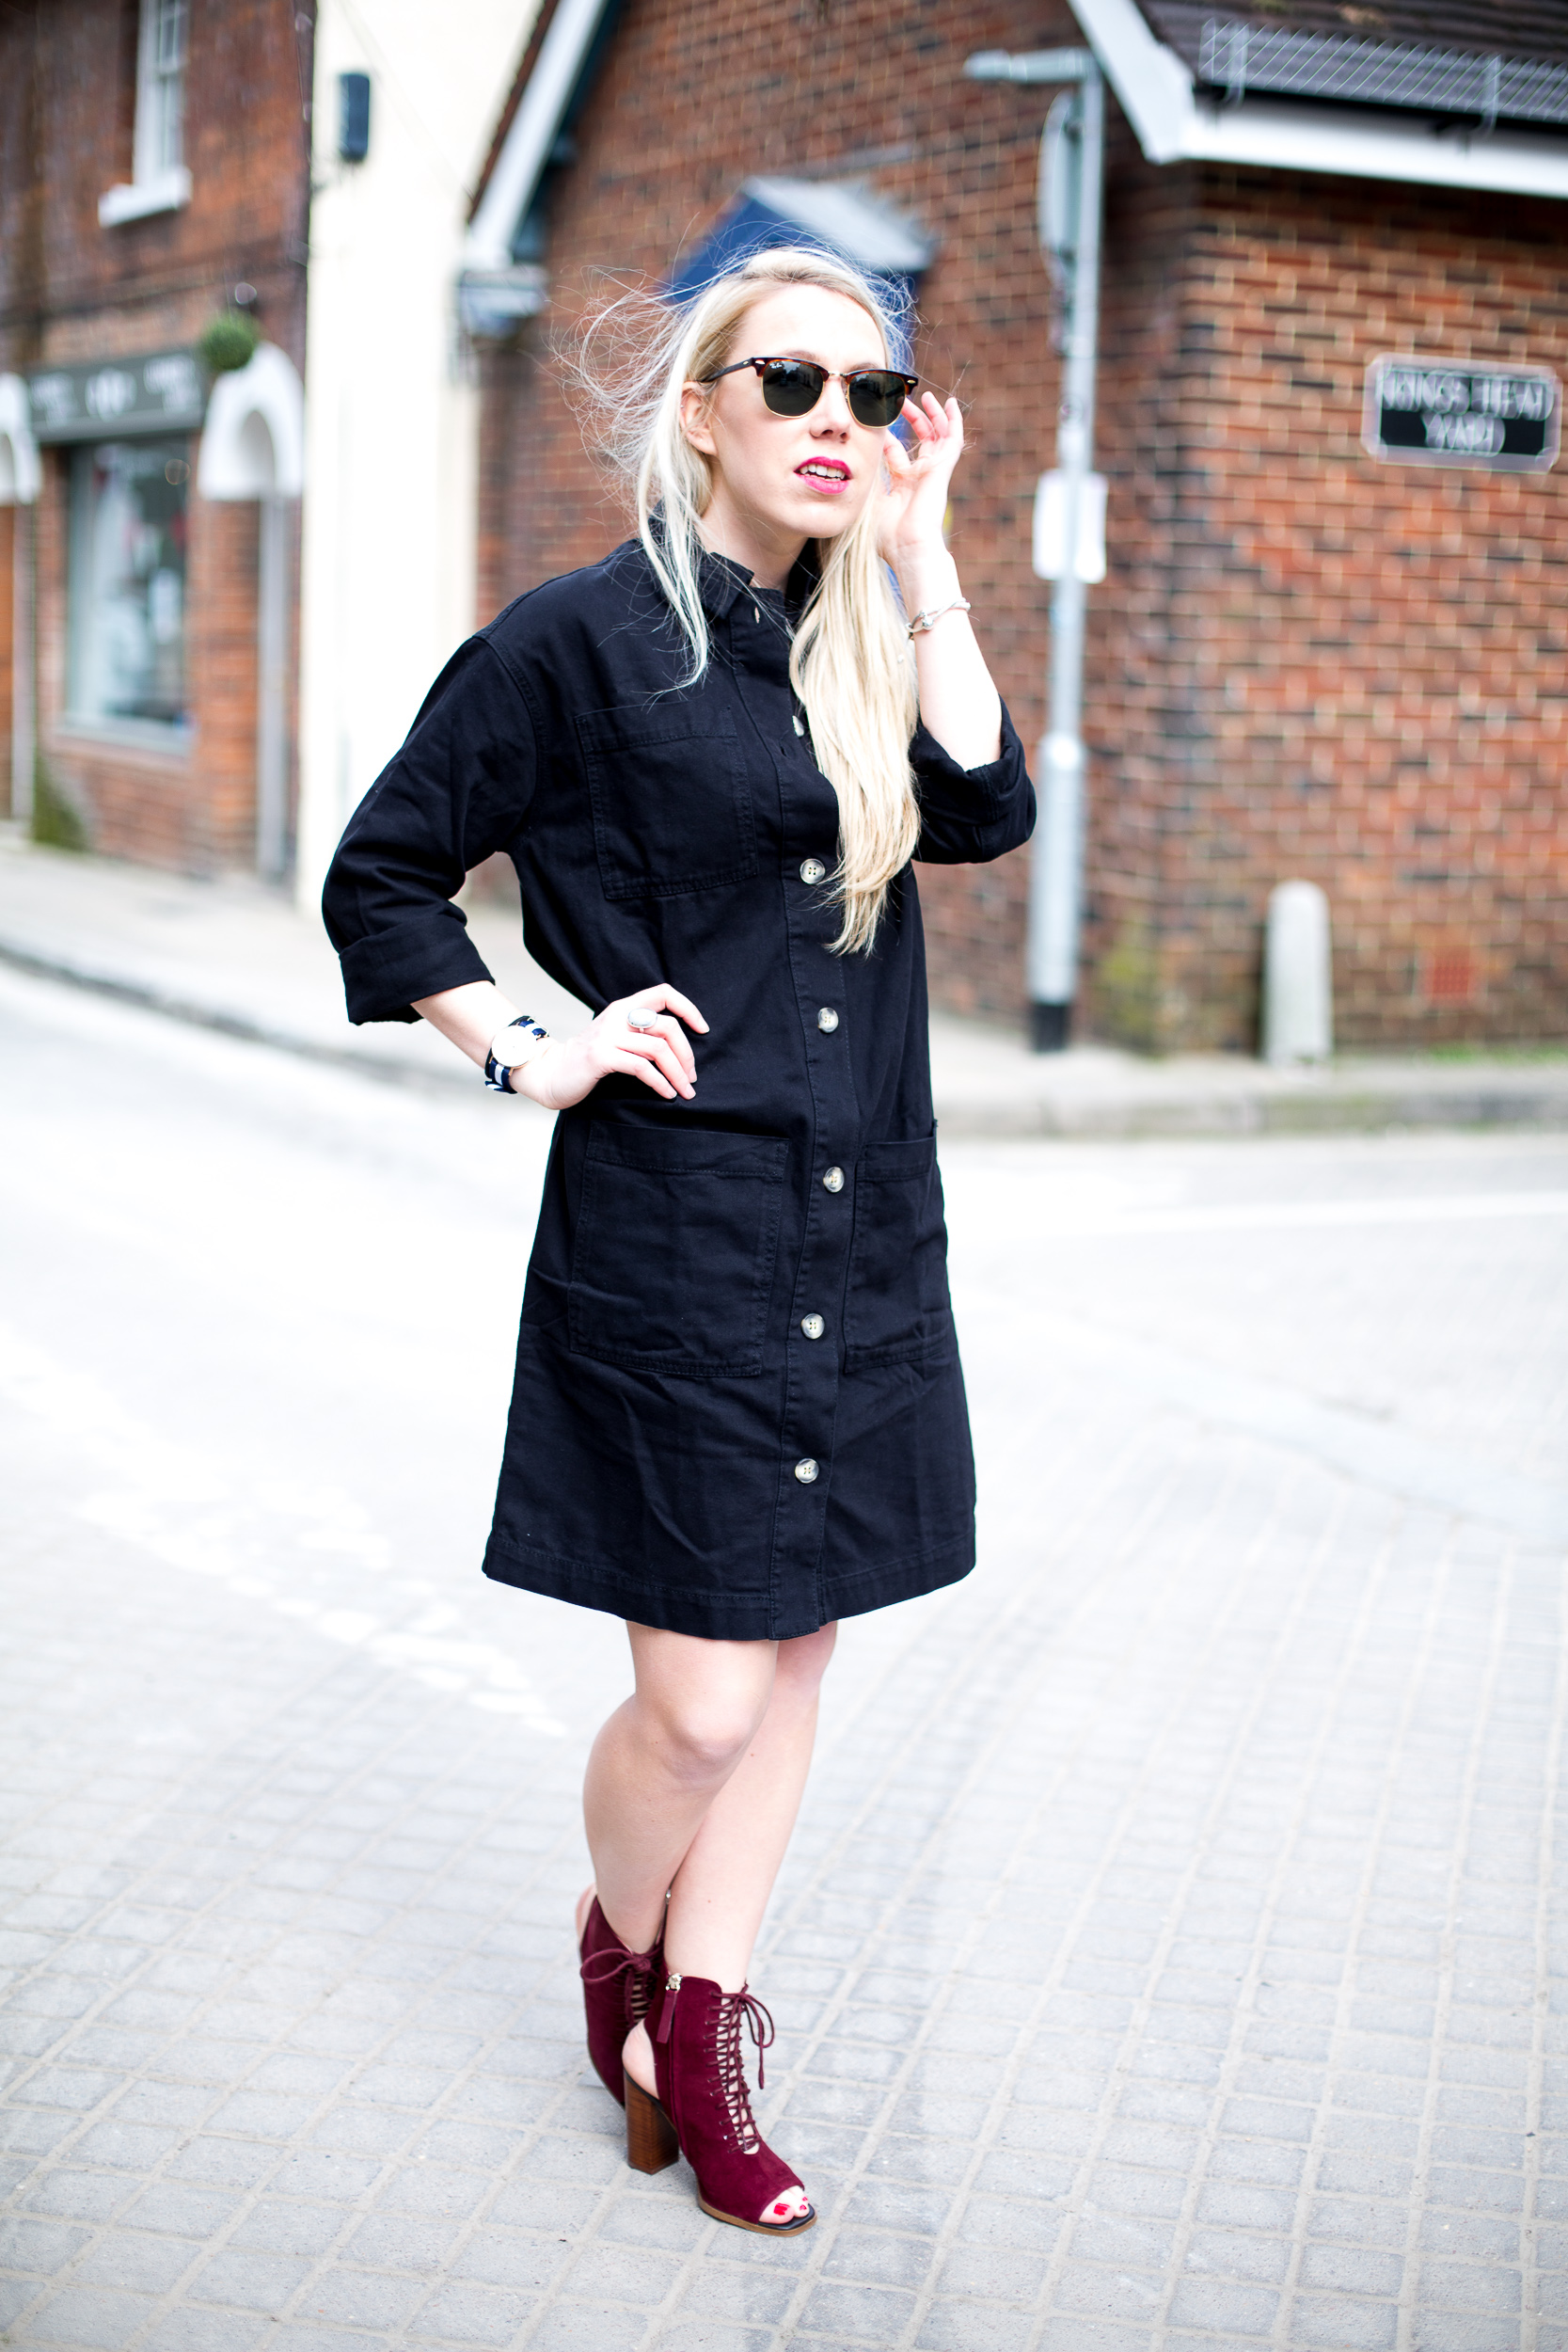 Black dress jean shirt - Denim Shirt With Black Dress